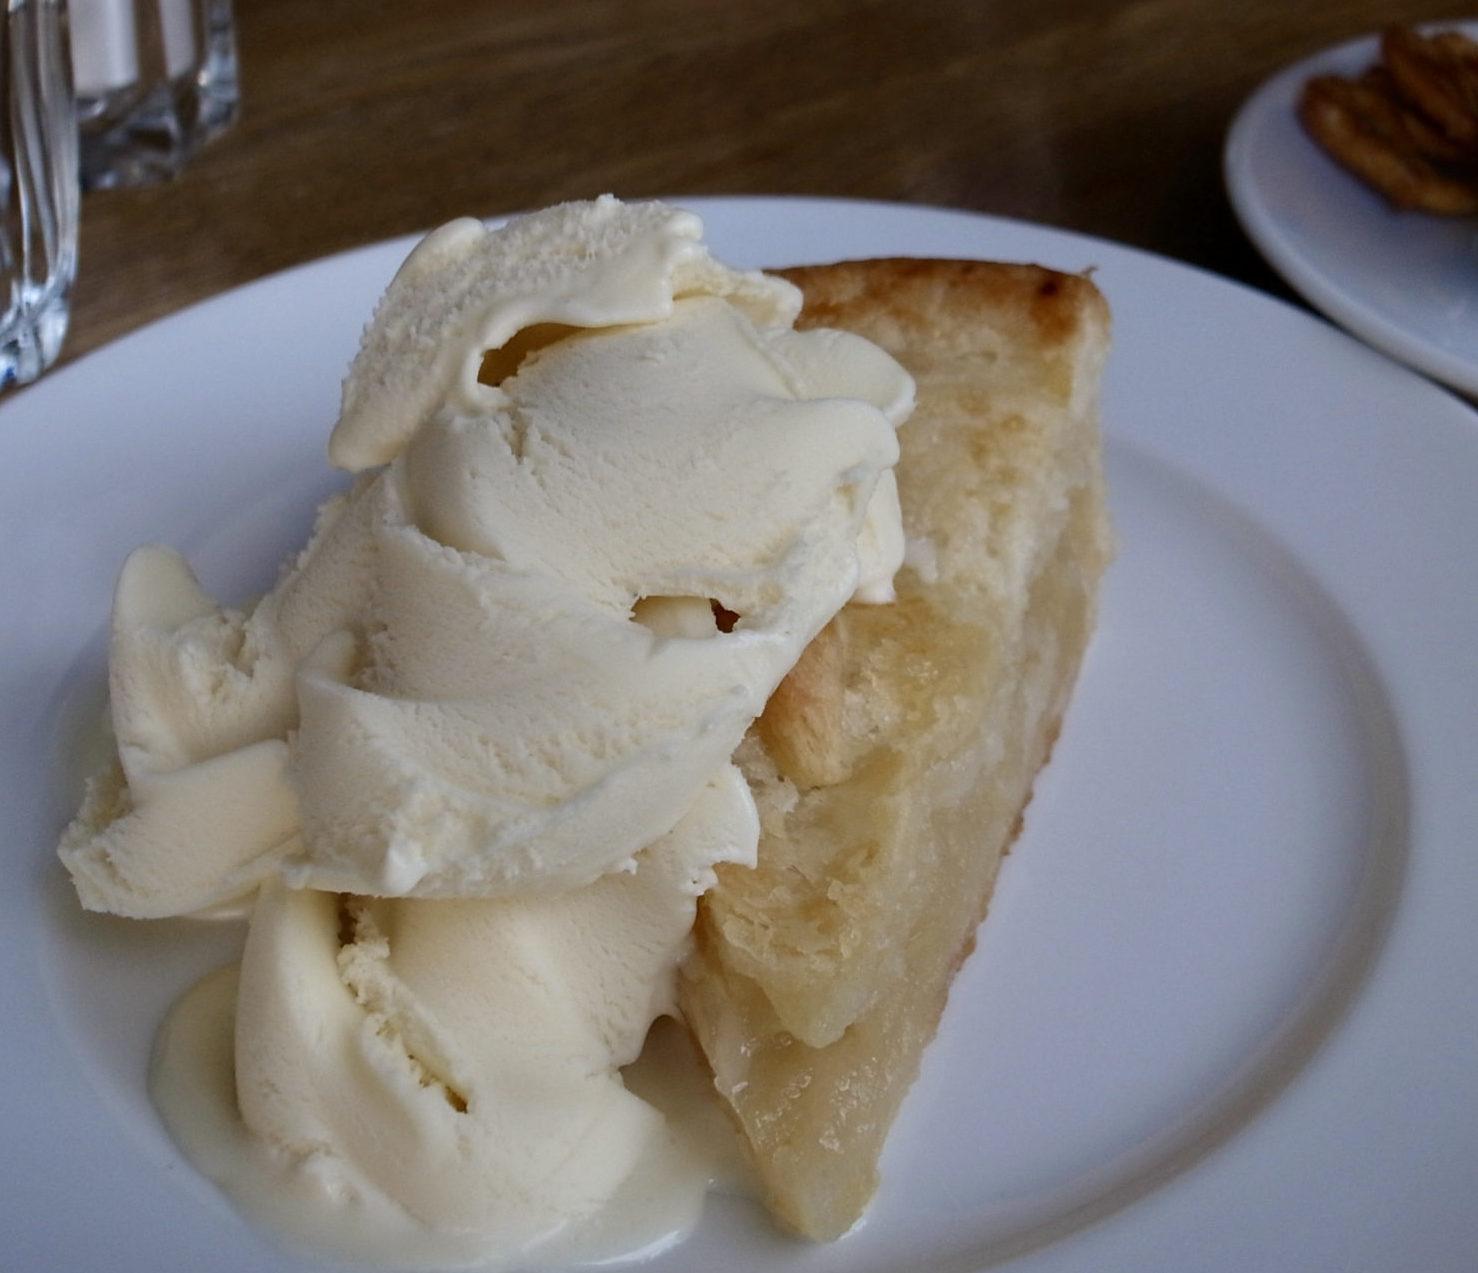 Apple pie & CaféLatte